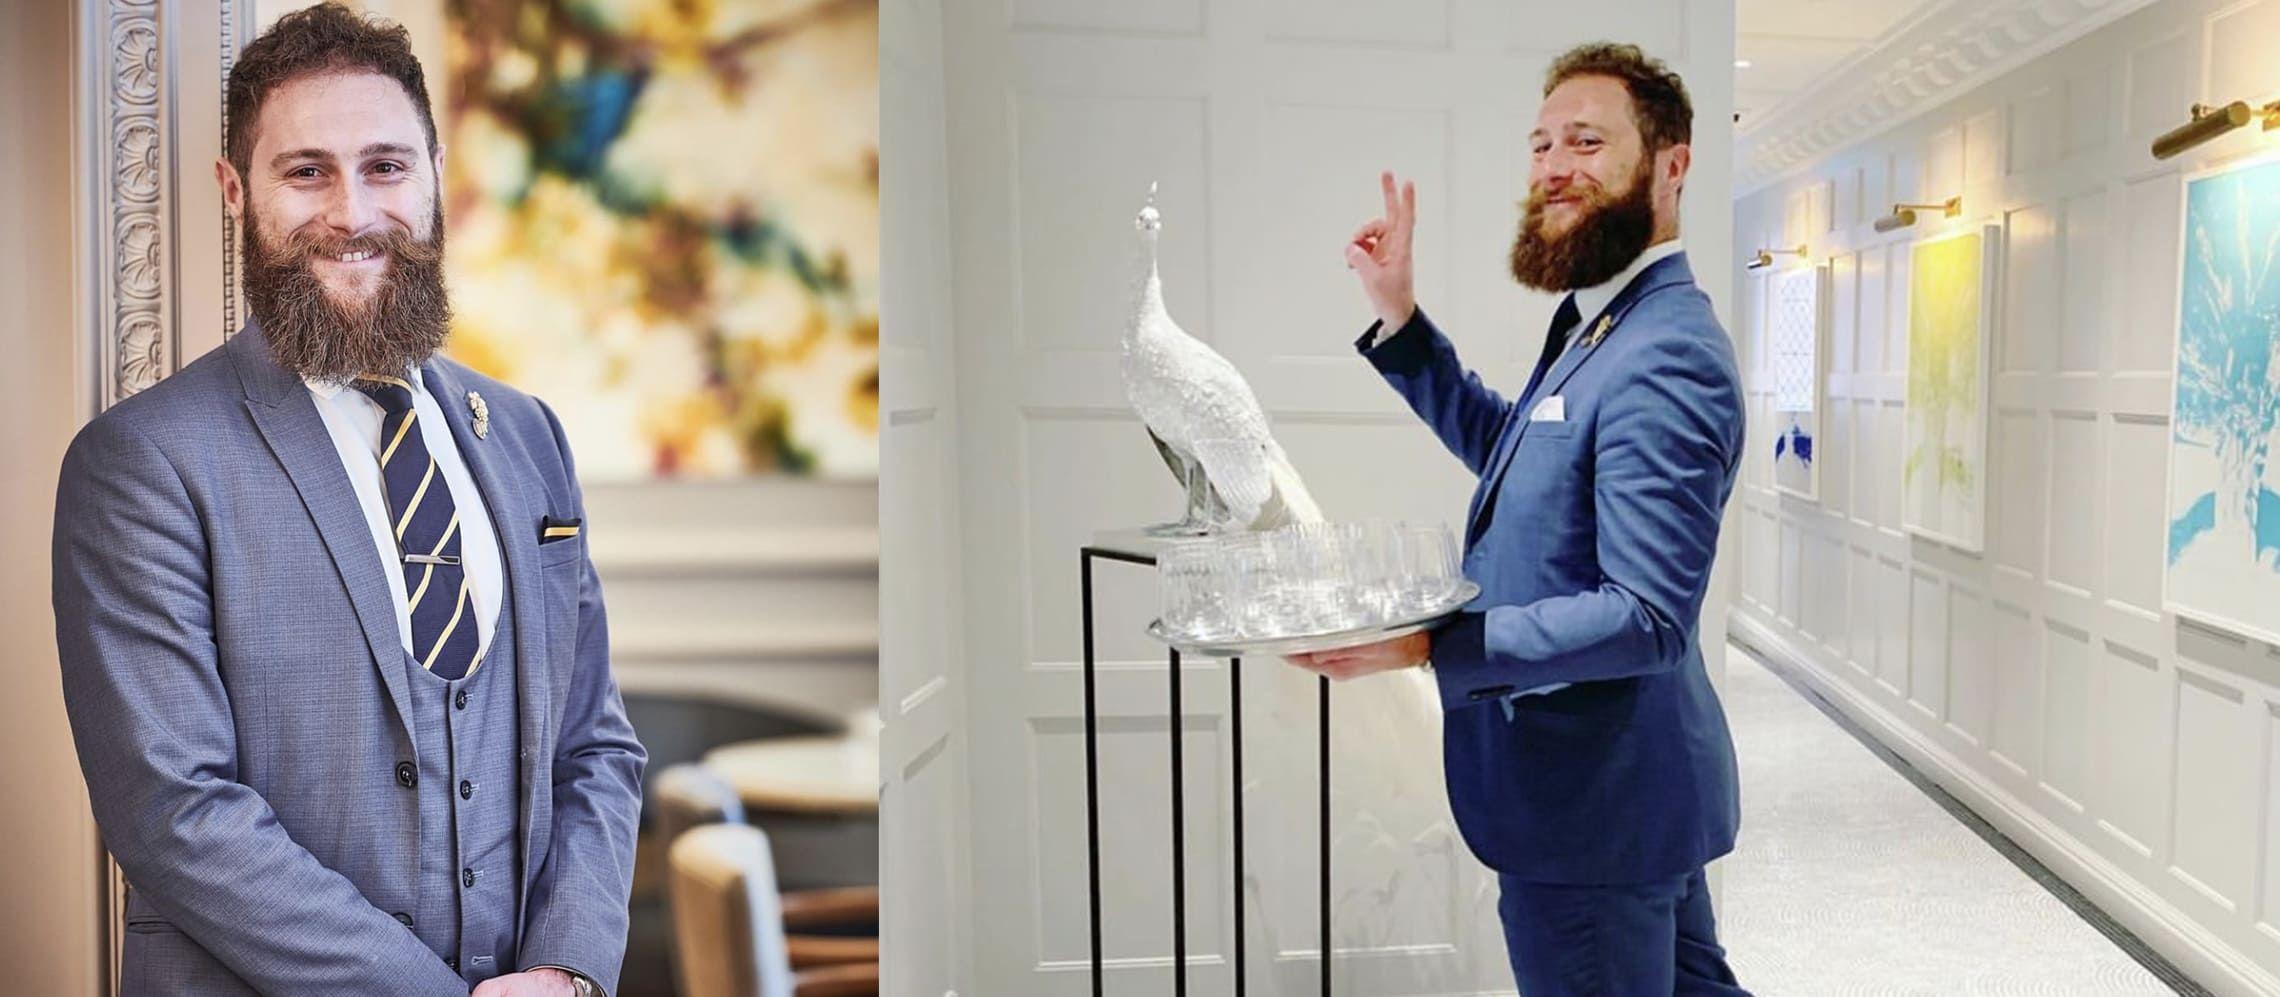 Photo for: Meet Angelo Altobelli, Head Sommelier at Belmond Cadogan Hotel